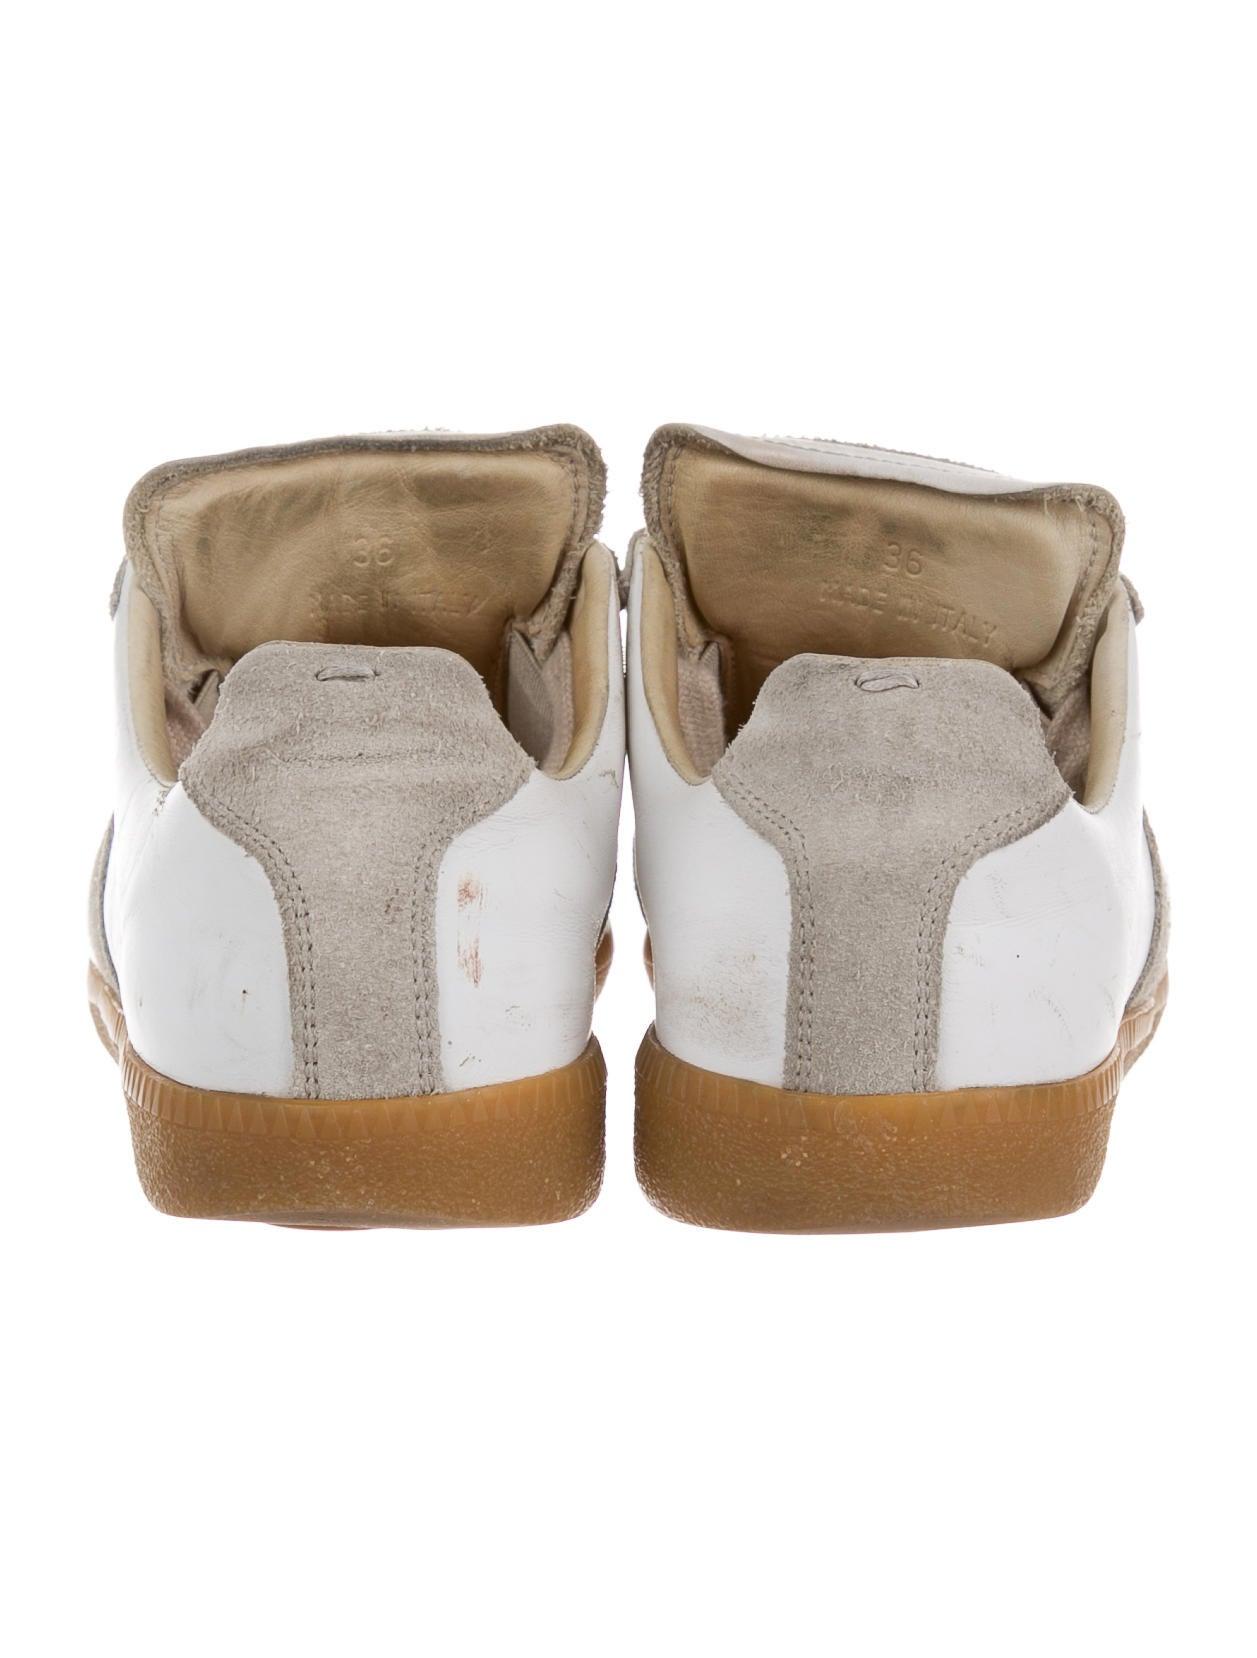 Maison martin margiela leather low top sneakers shoes for Maison martin margiela